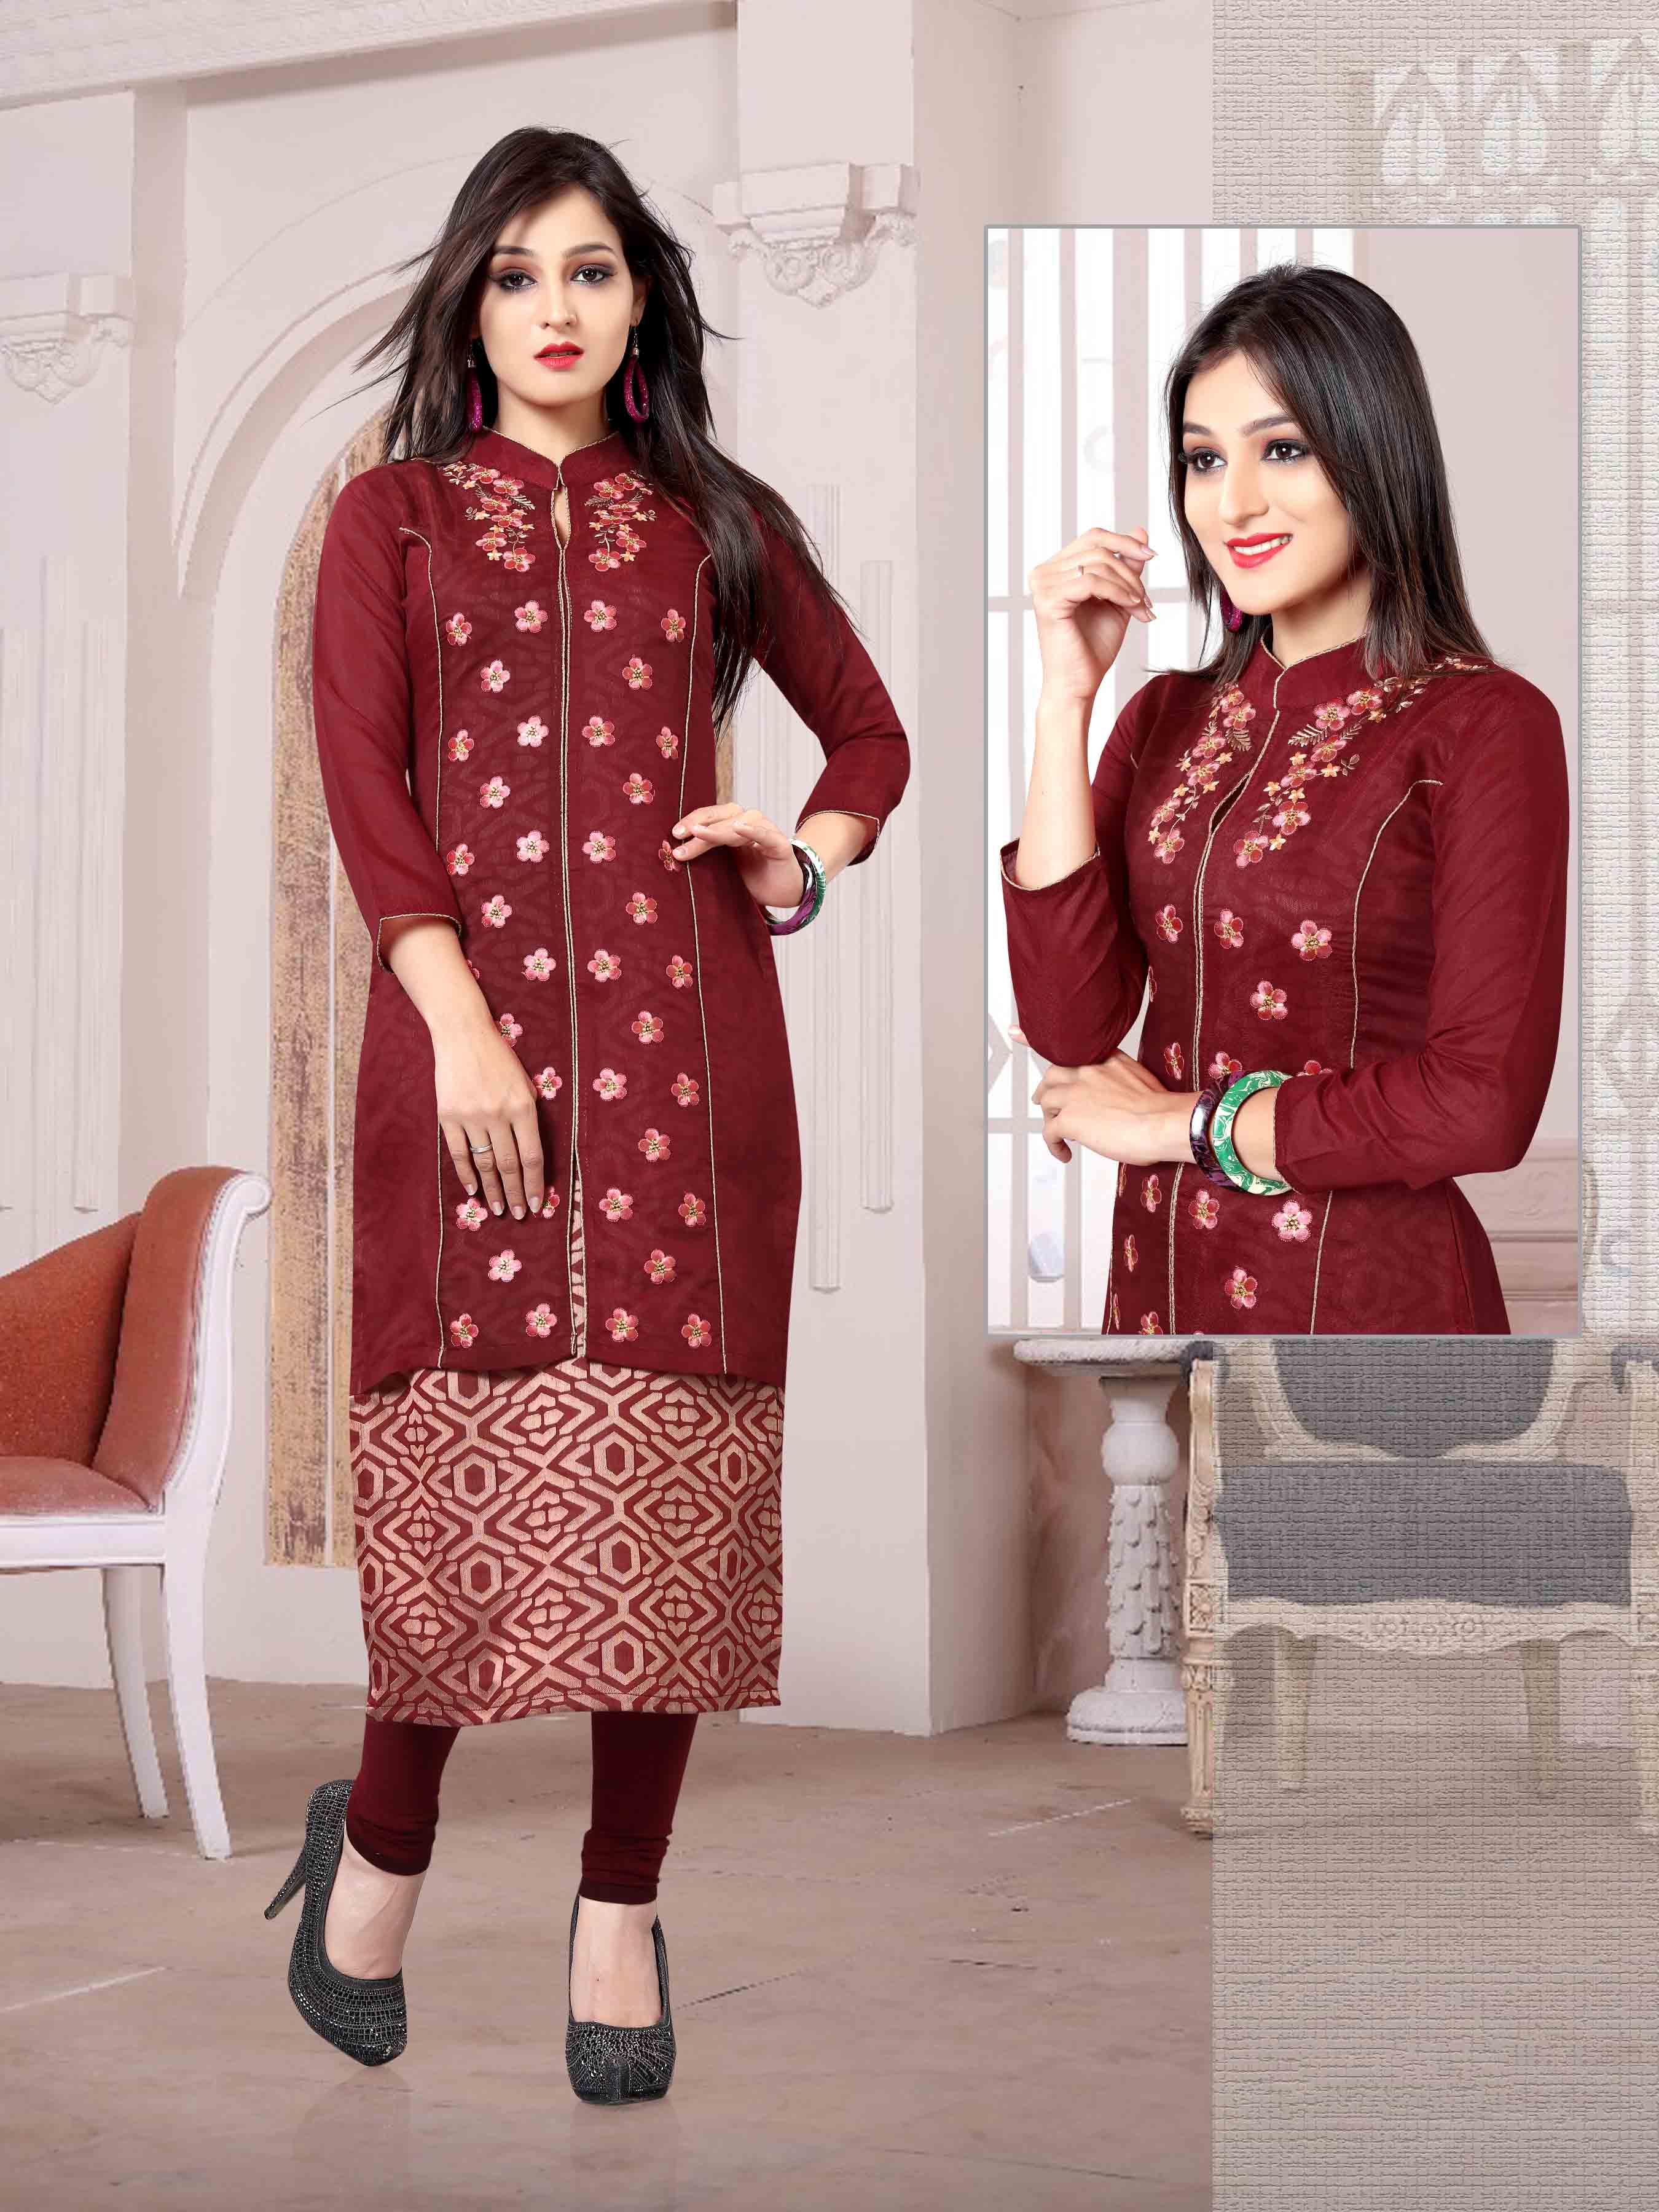 Chanderi Chex & Rayon Kurti Nexa CB067 | Readymade Wear